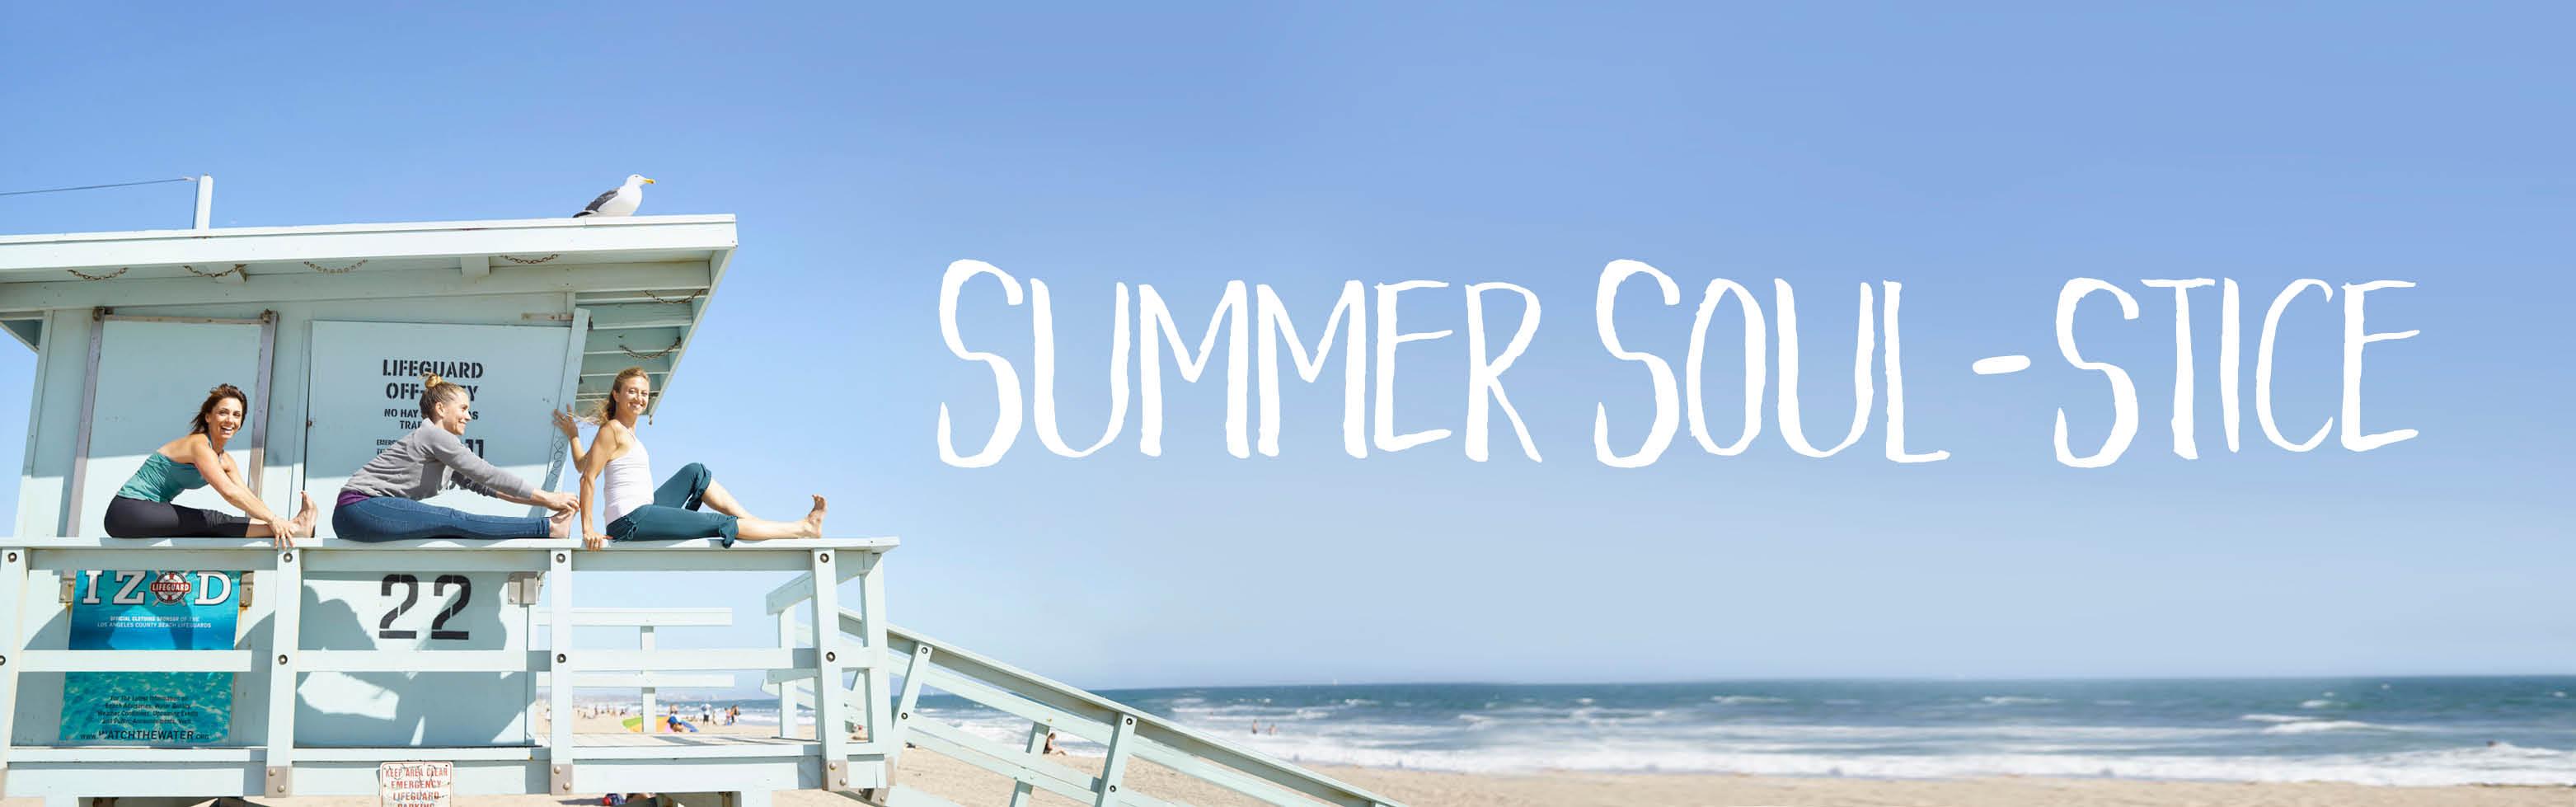 Summer Soul-stice Challenge